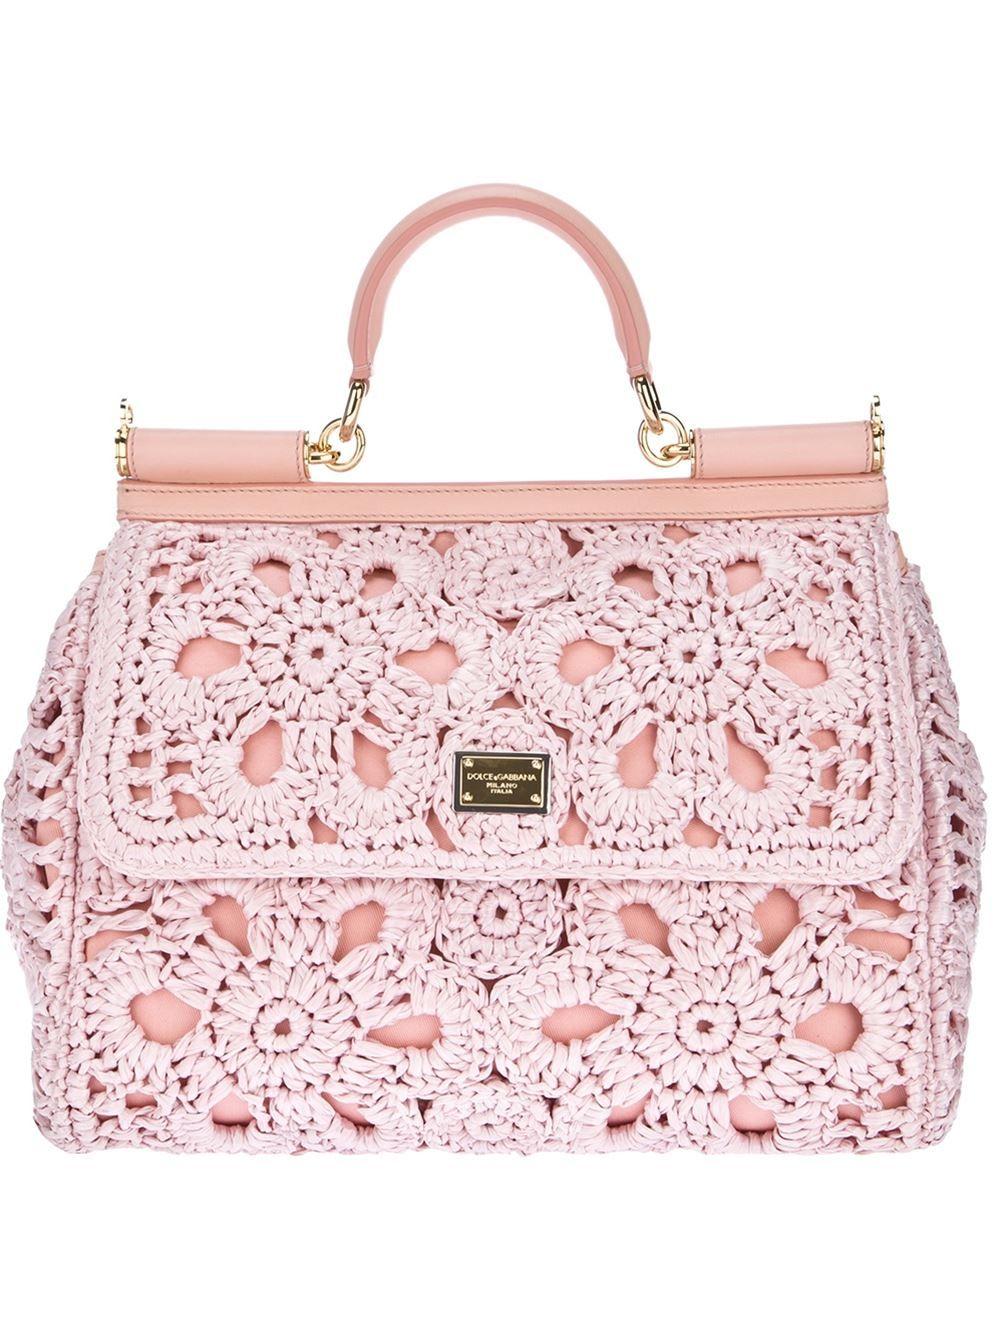 a7b4a002c8fe Dolce   Gabbana  miss Sicily  Tote - - Farfetch.com